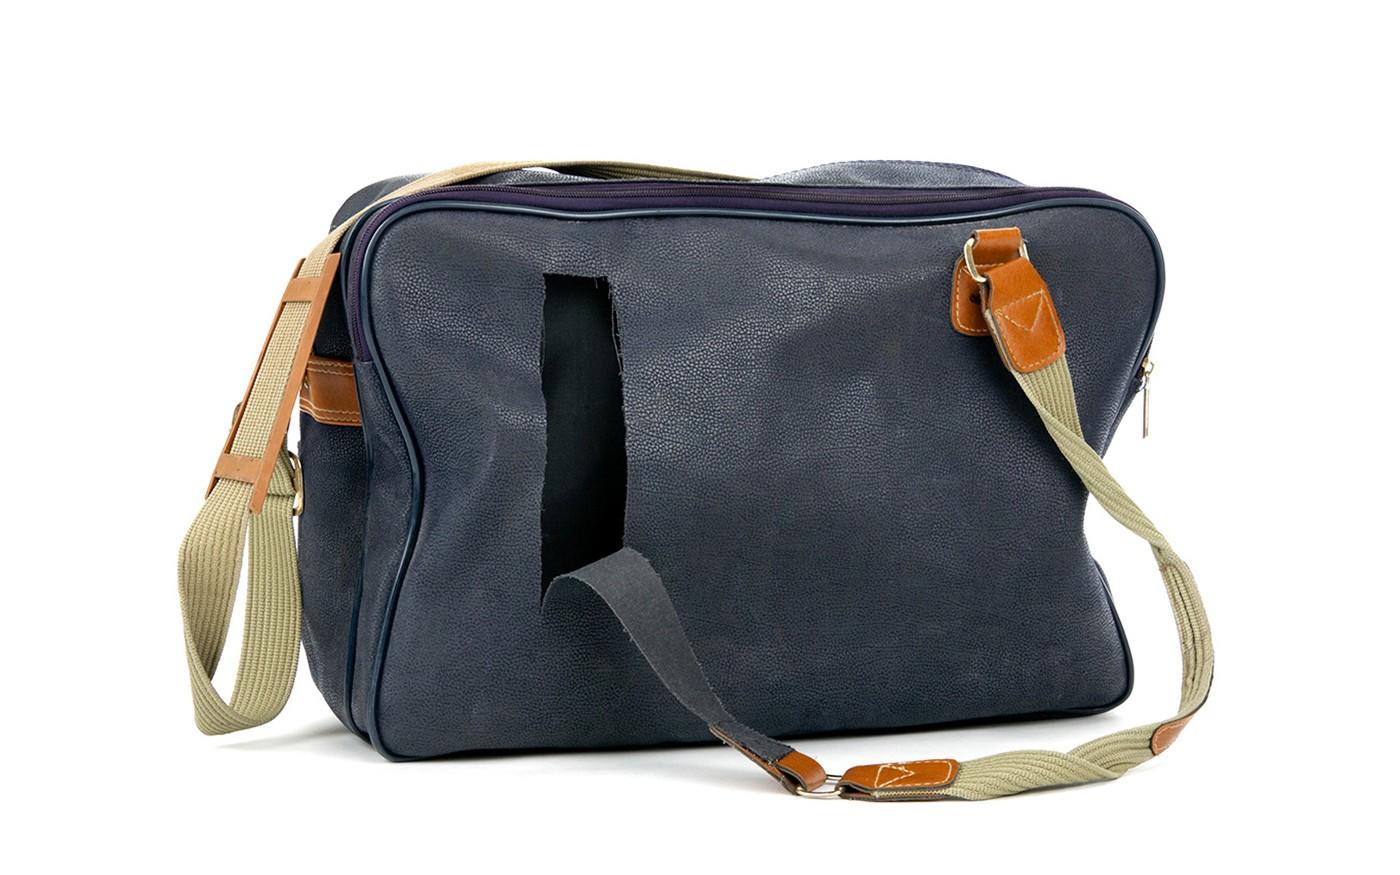 Leather handbag broken strap